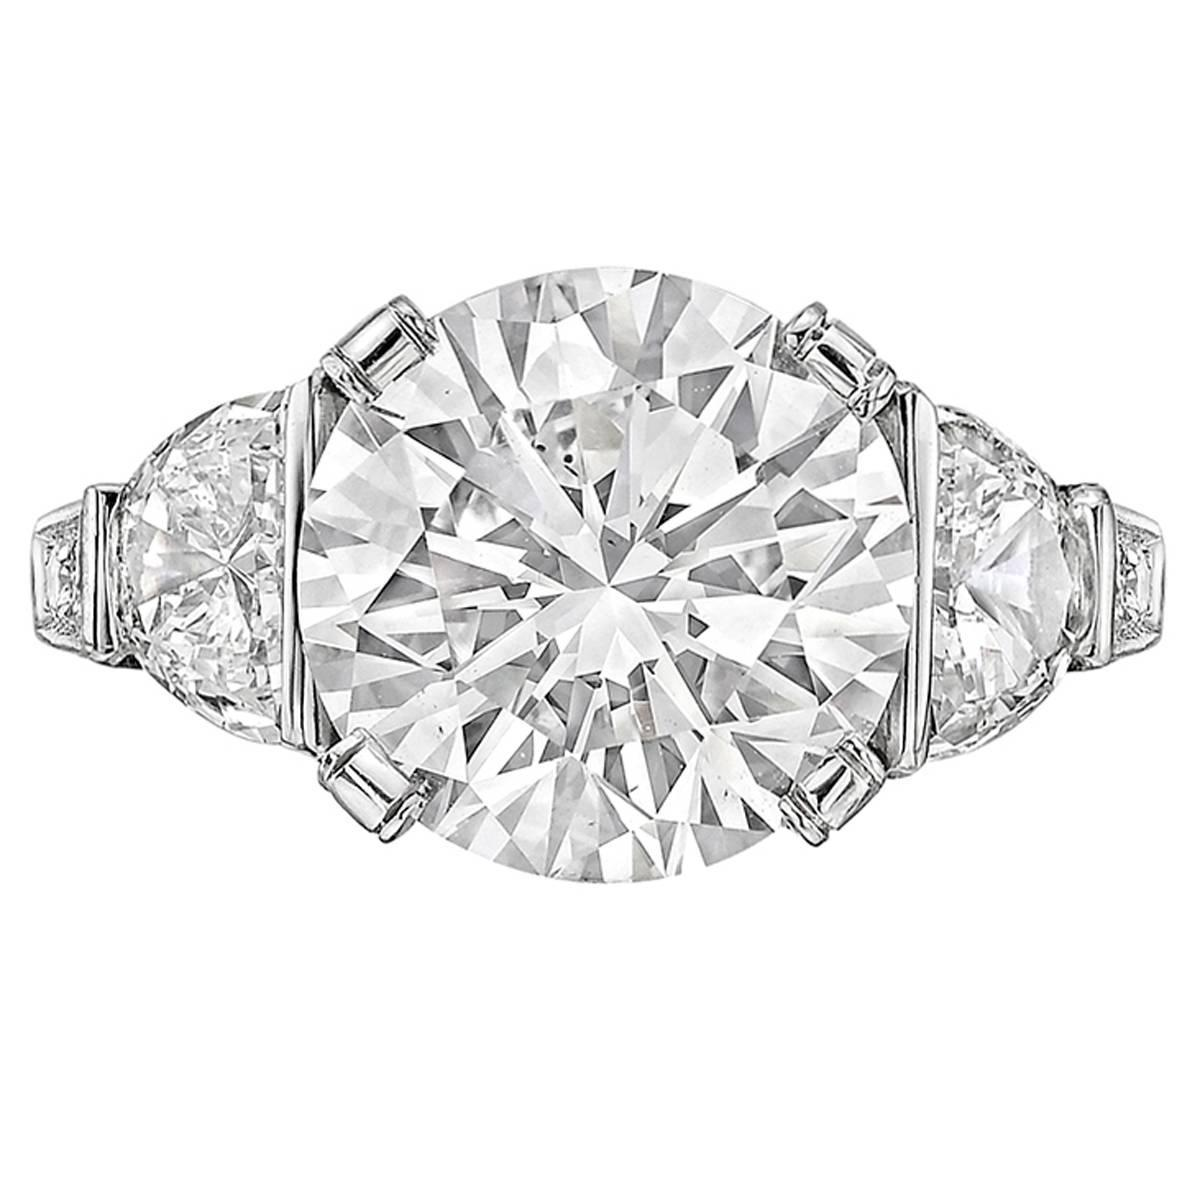 4 03 Carat Round Brilliant Cut Diamond Ring For Sale At